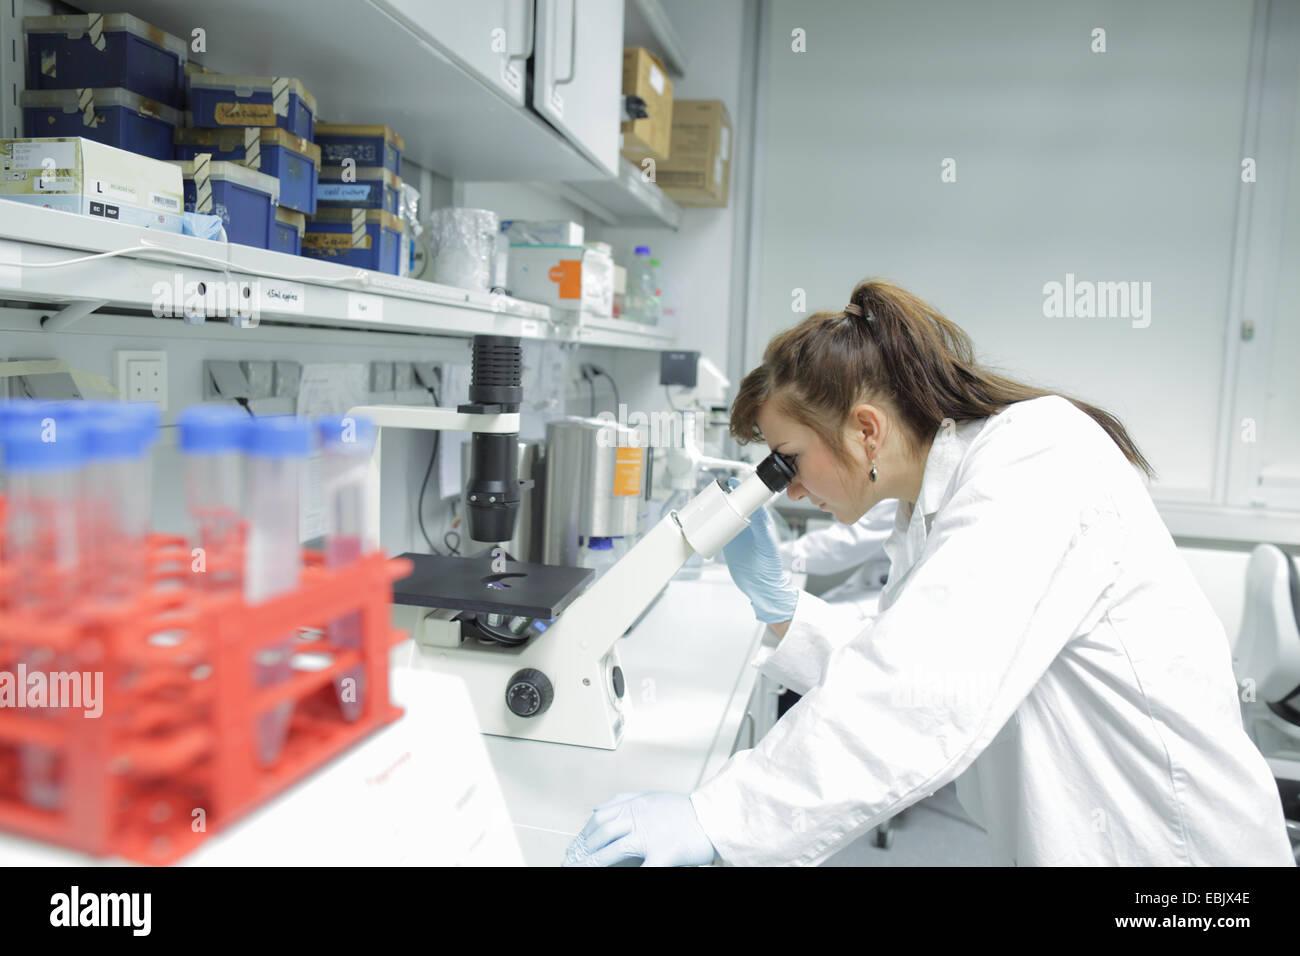 Biologie laboranten prüflinge durch mikroskop betrachten stockfoto